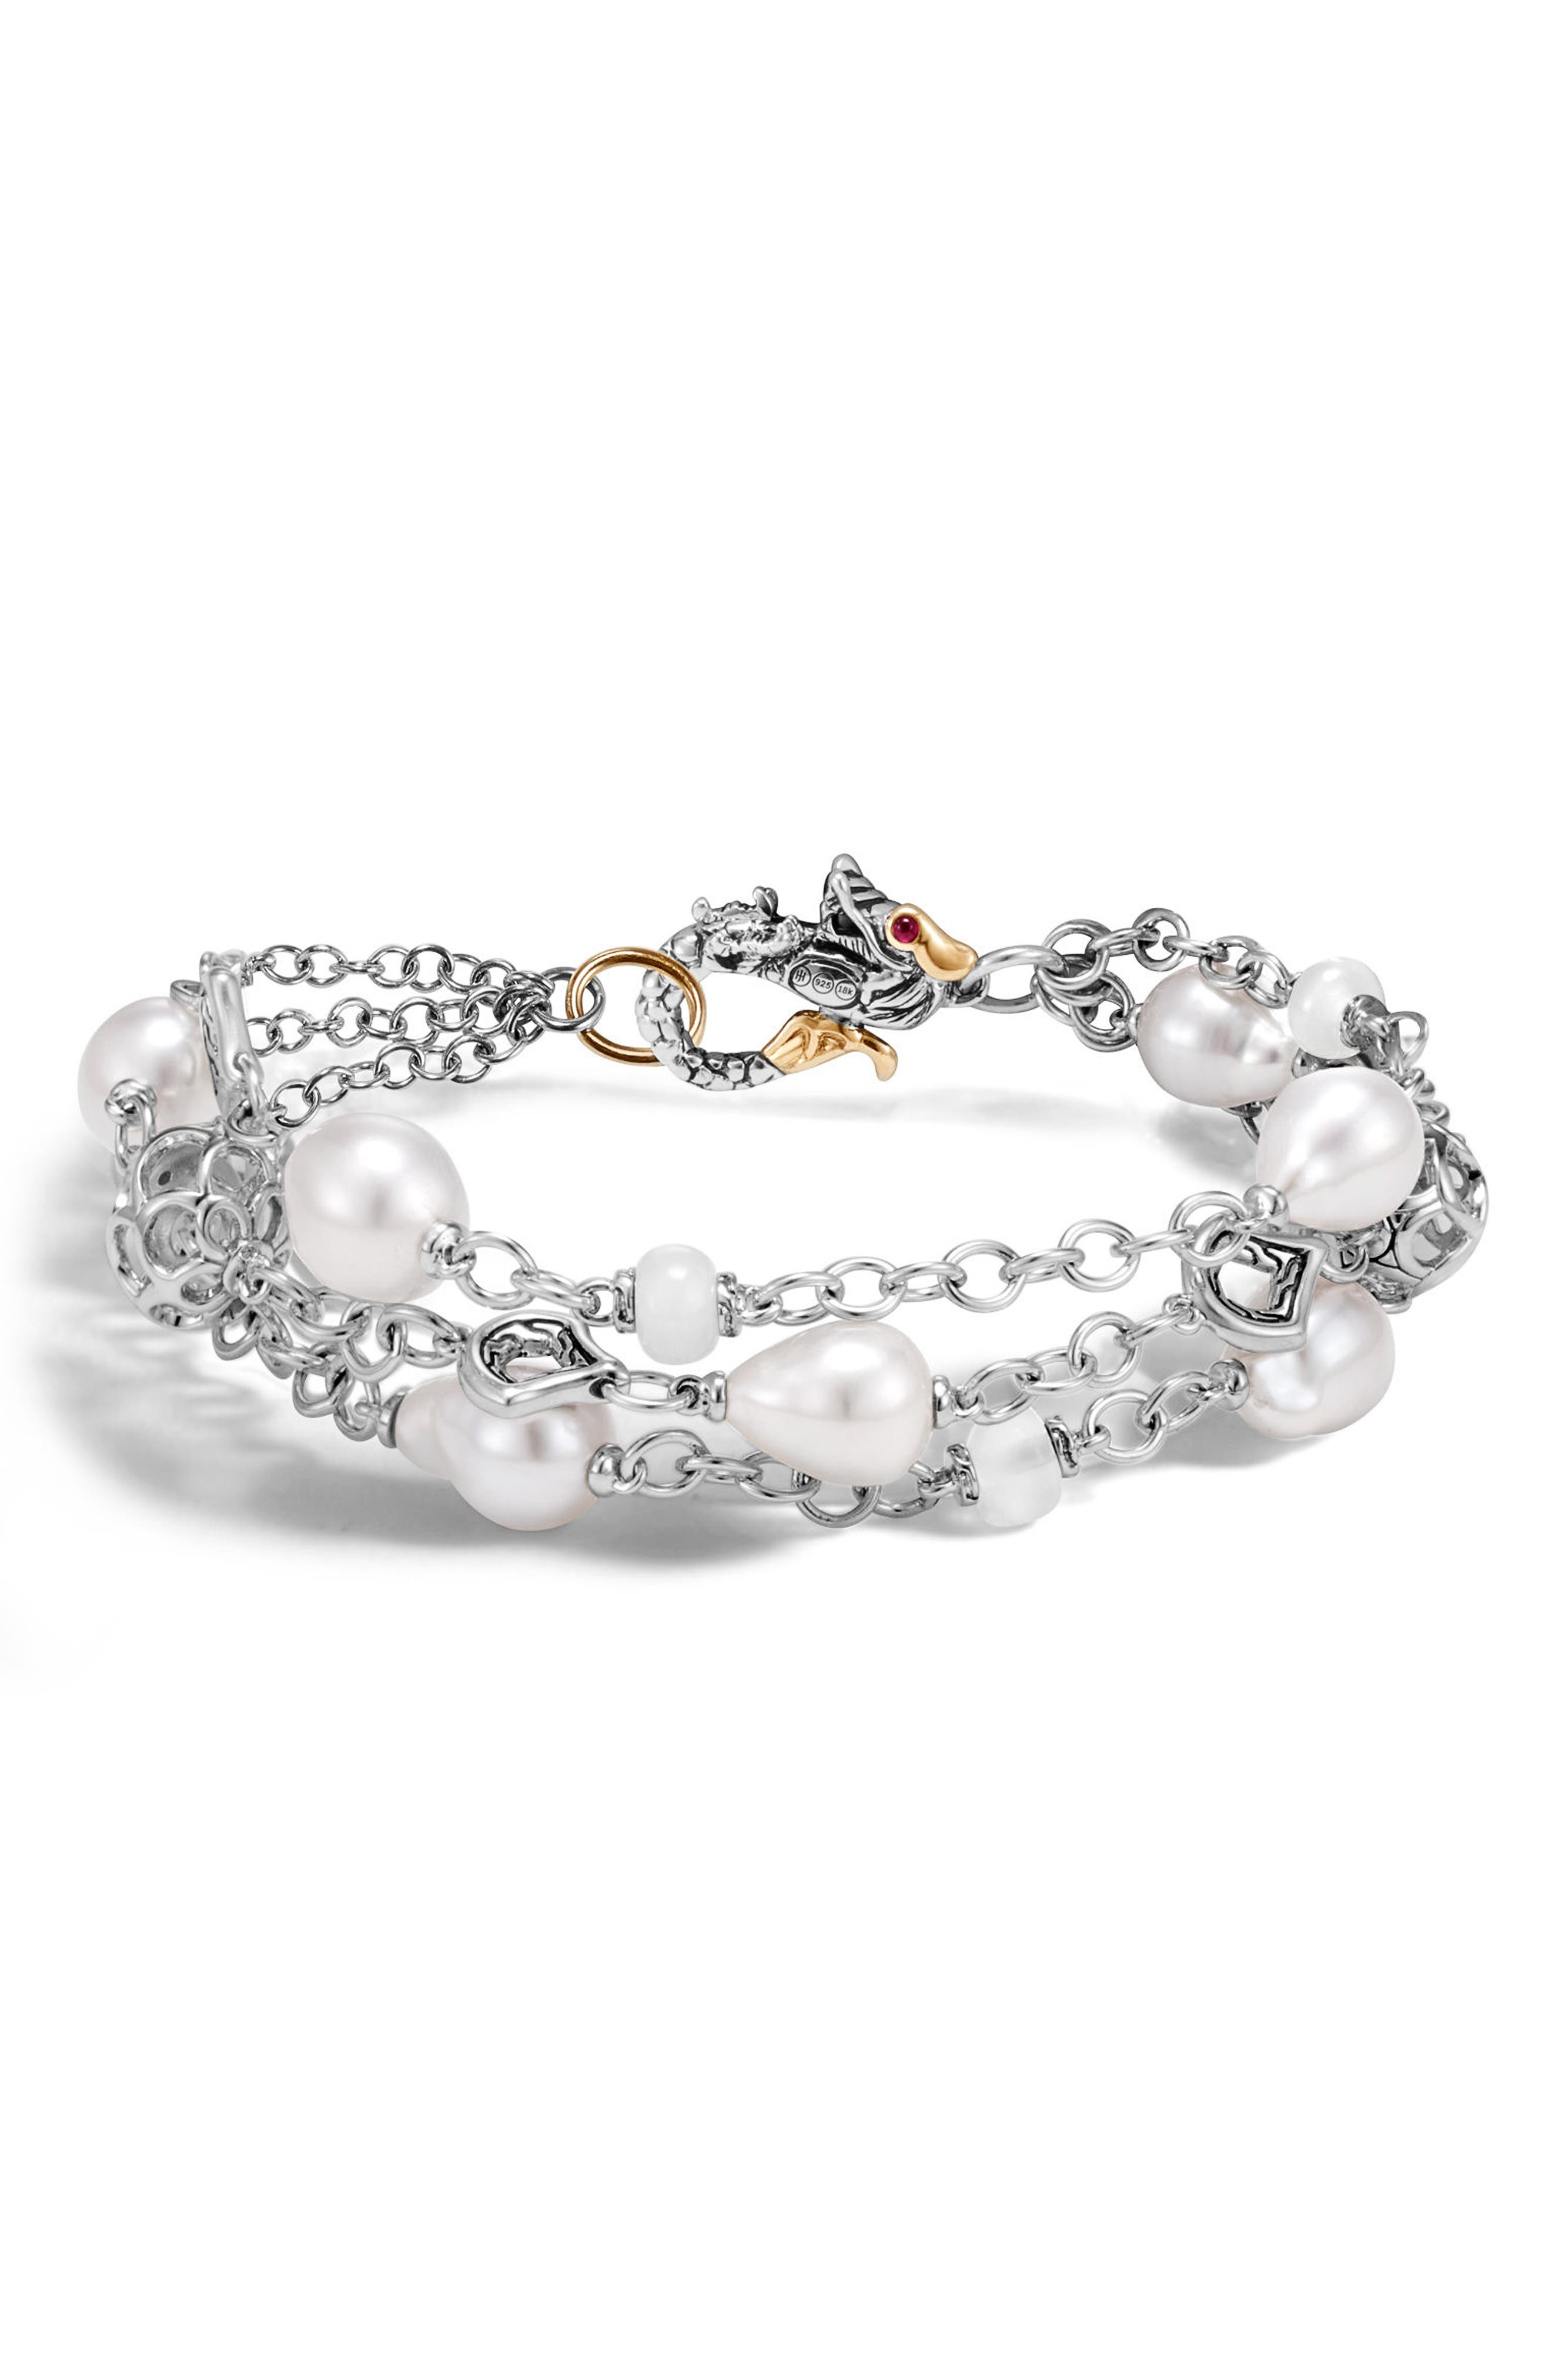 Legends Pearl Bracelet,                             Main thumbnail 1, color,                             Silver/ Gold/ Pearl